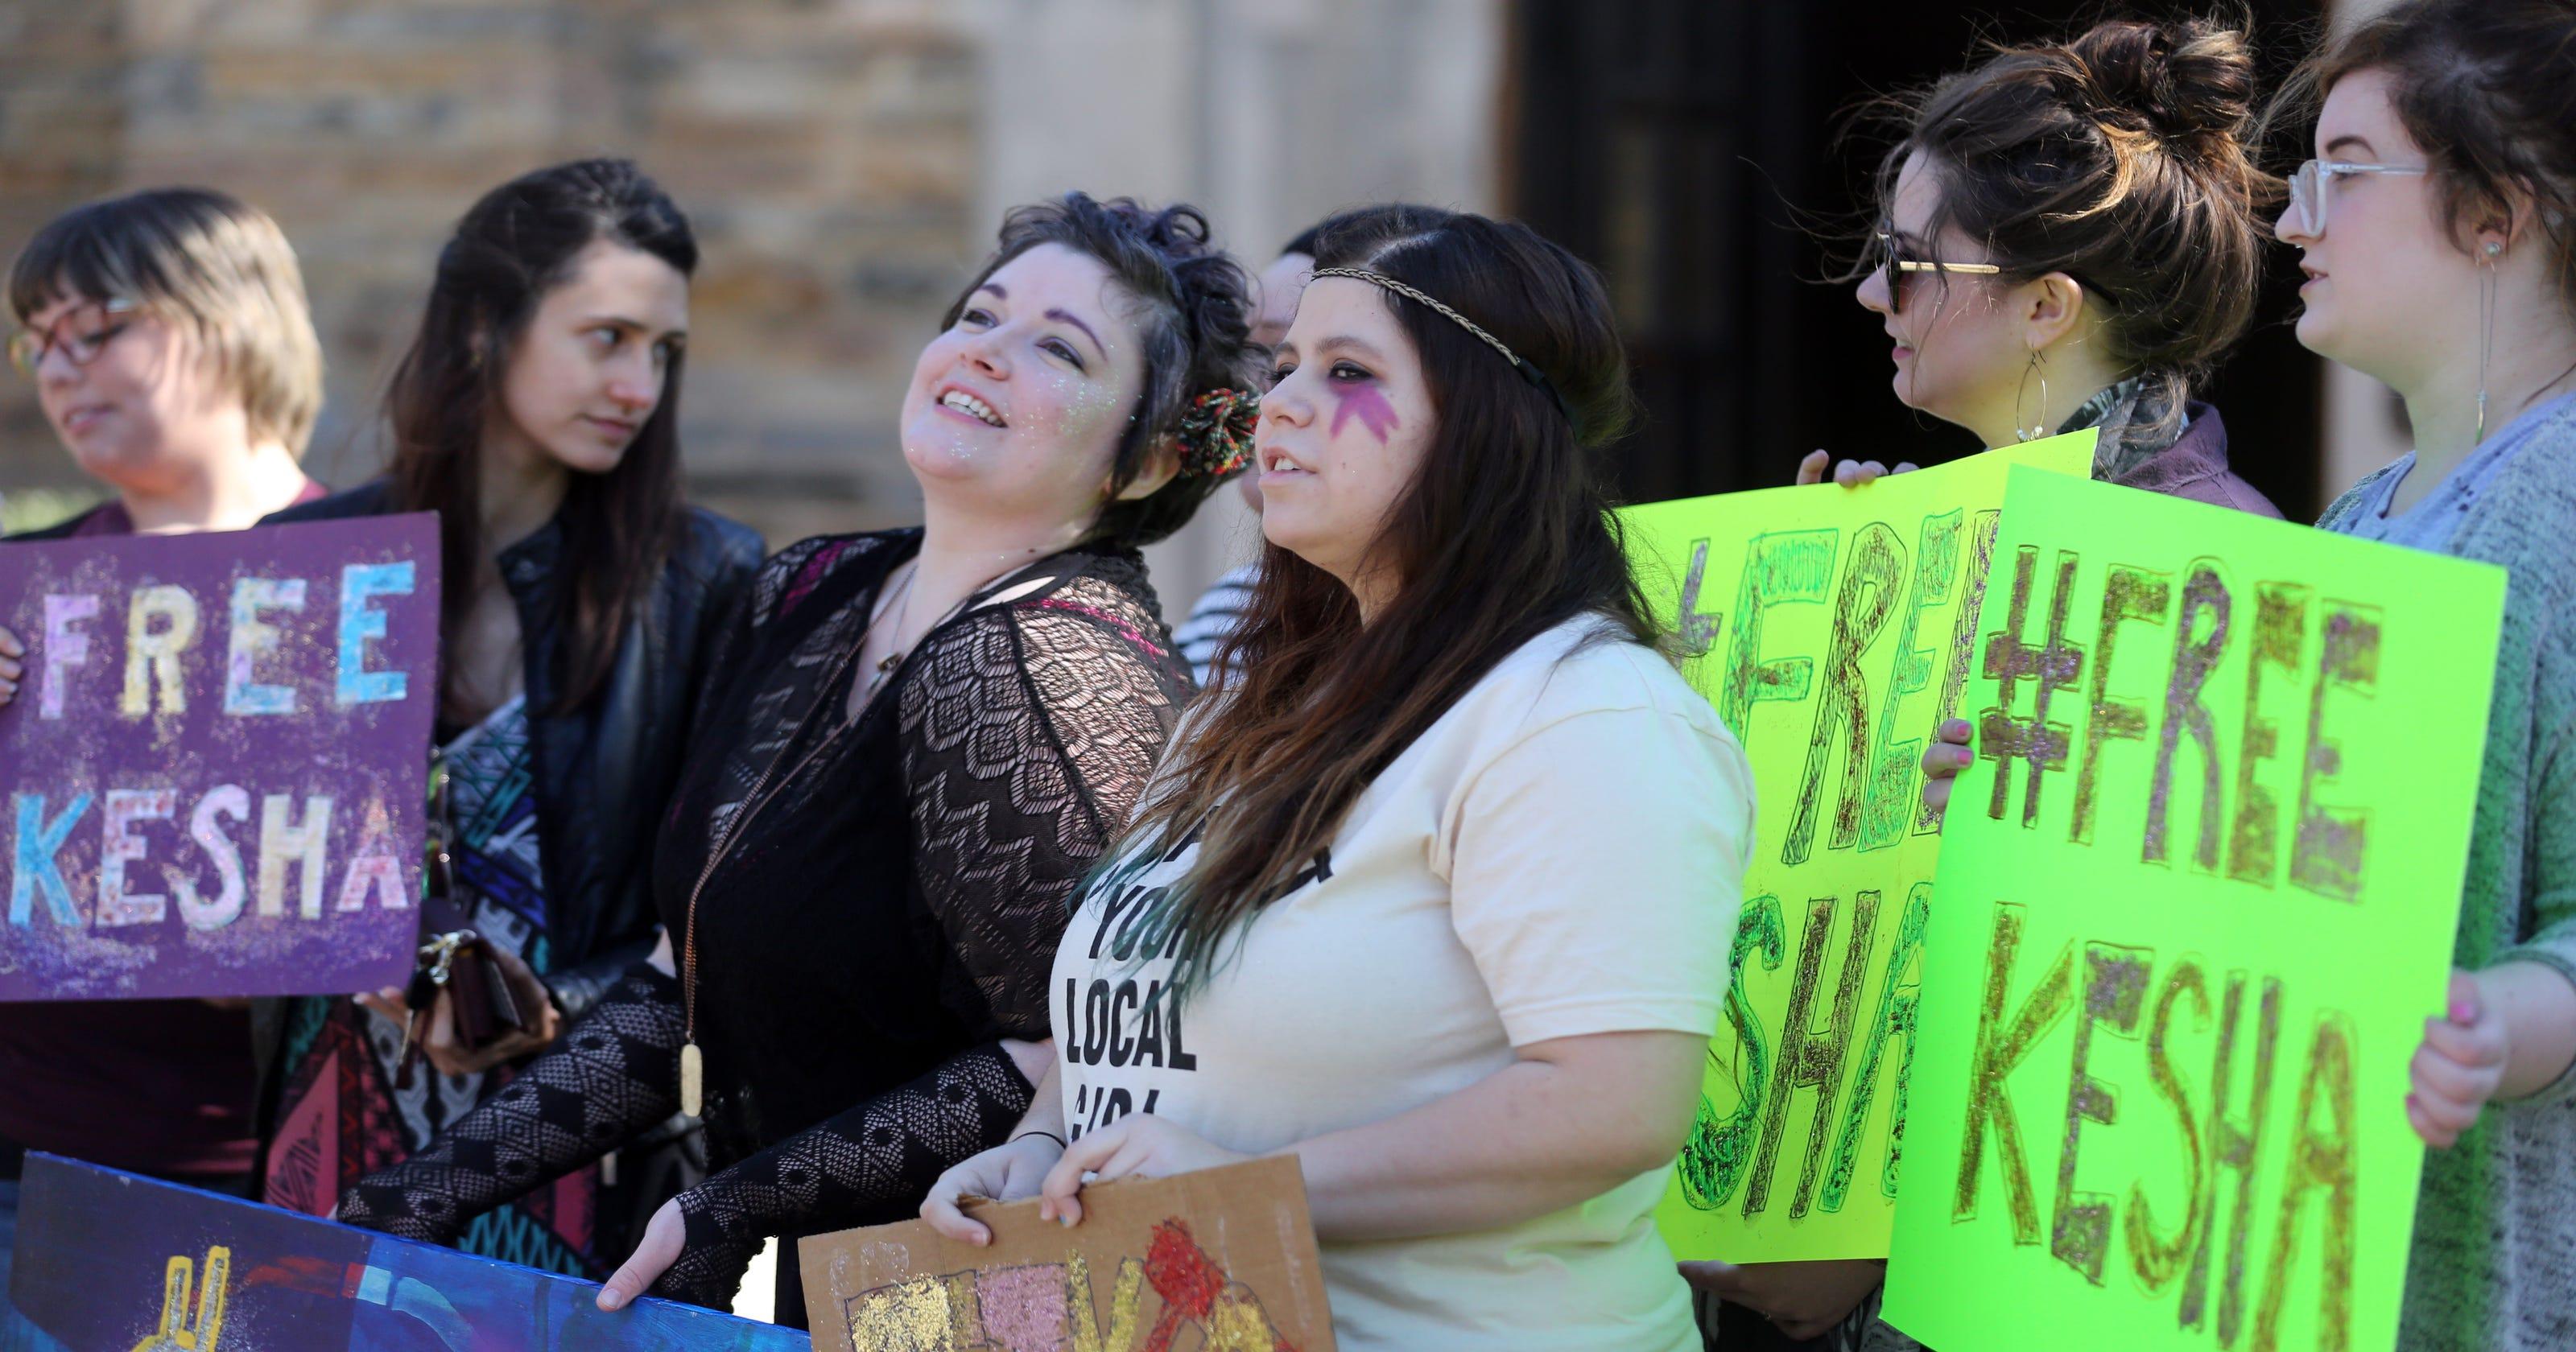 Kesha supporters rally outside Sony Music Nashville